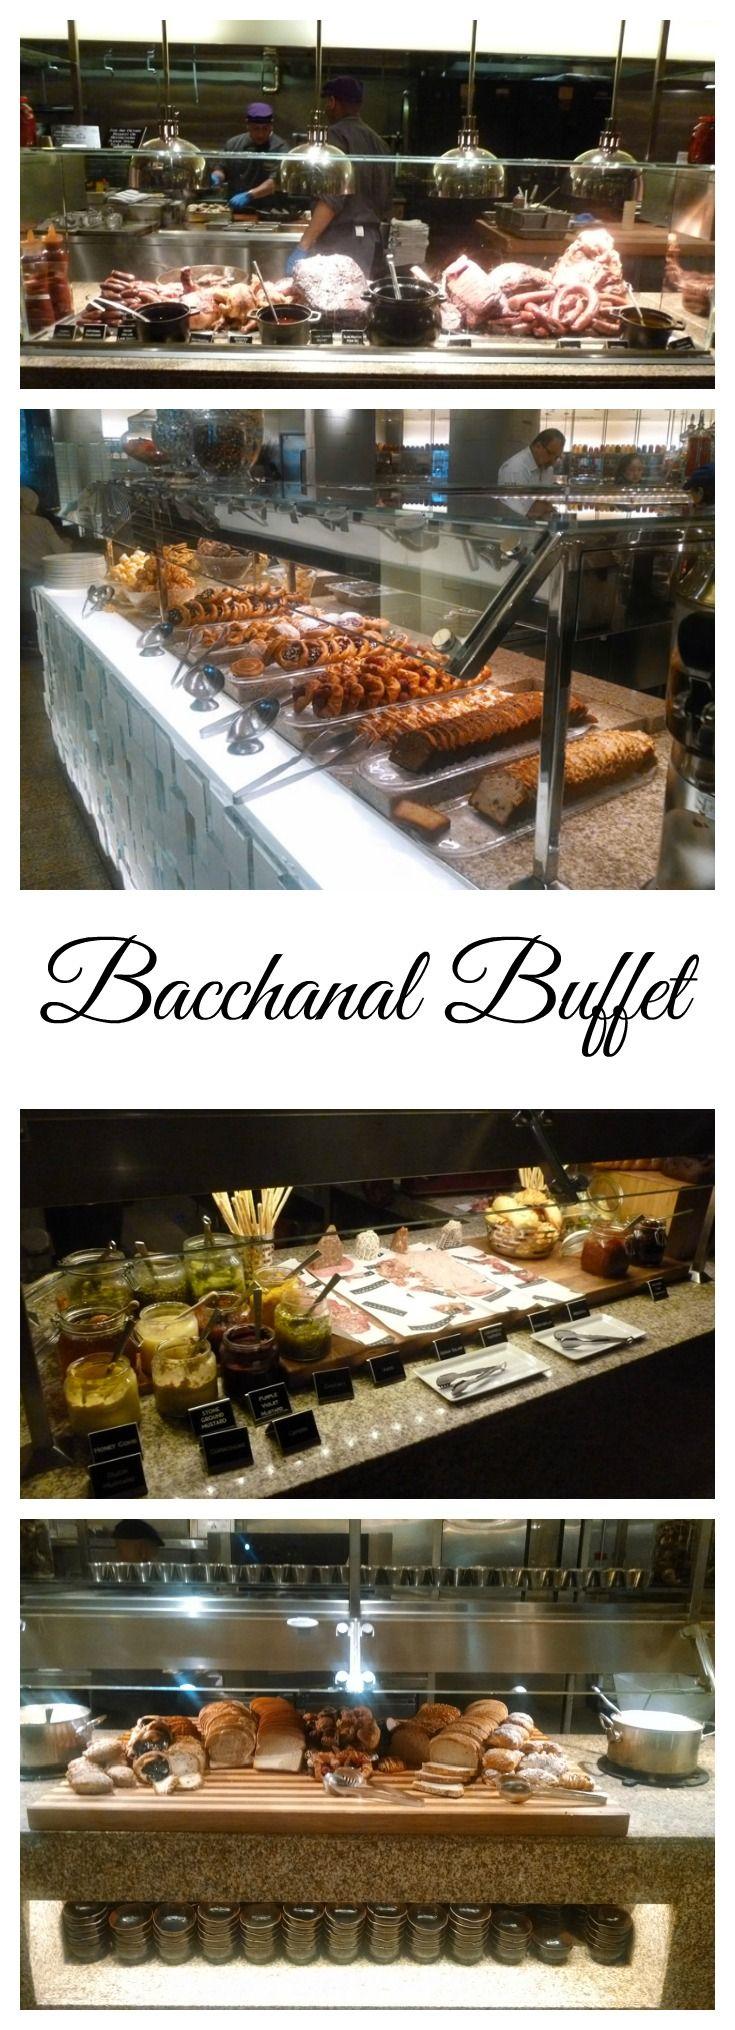 Super Bacchanal Buffet Prices Hours Reviews Best Las Vegas Download Free Architecture Designs Scobabritishbridgeorg